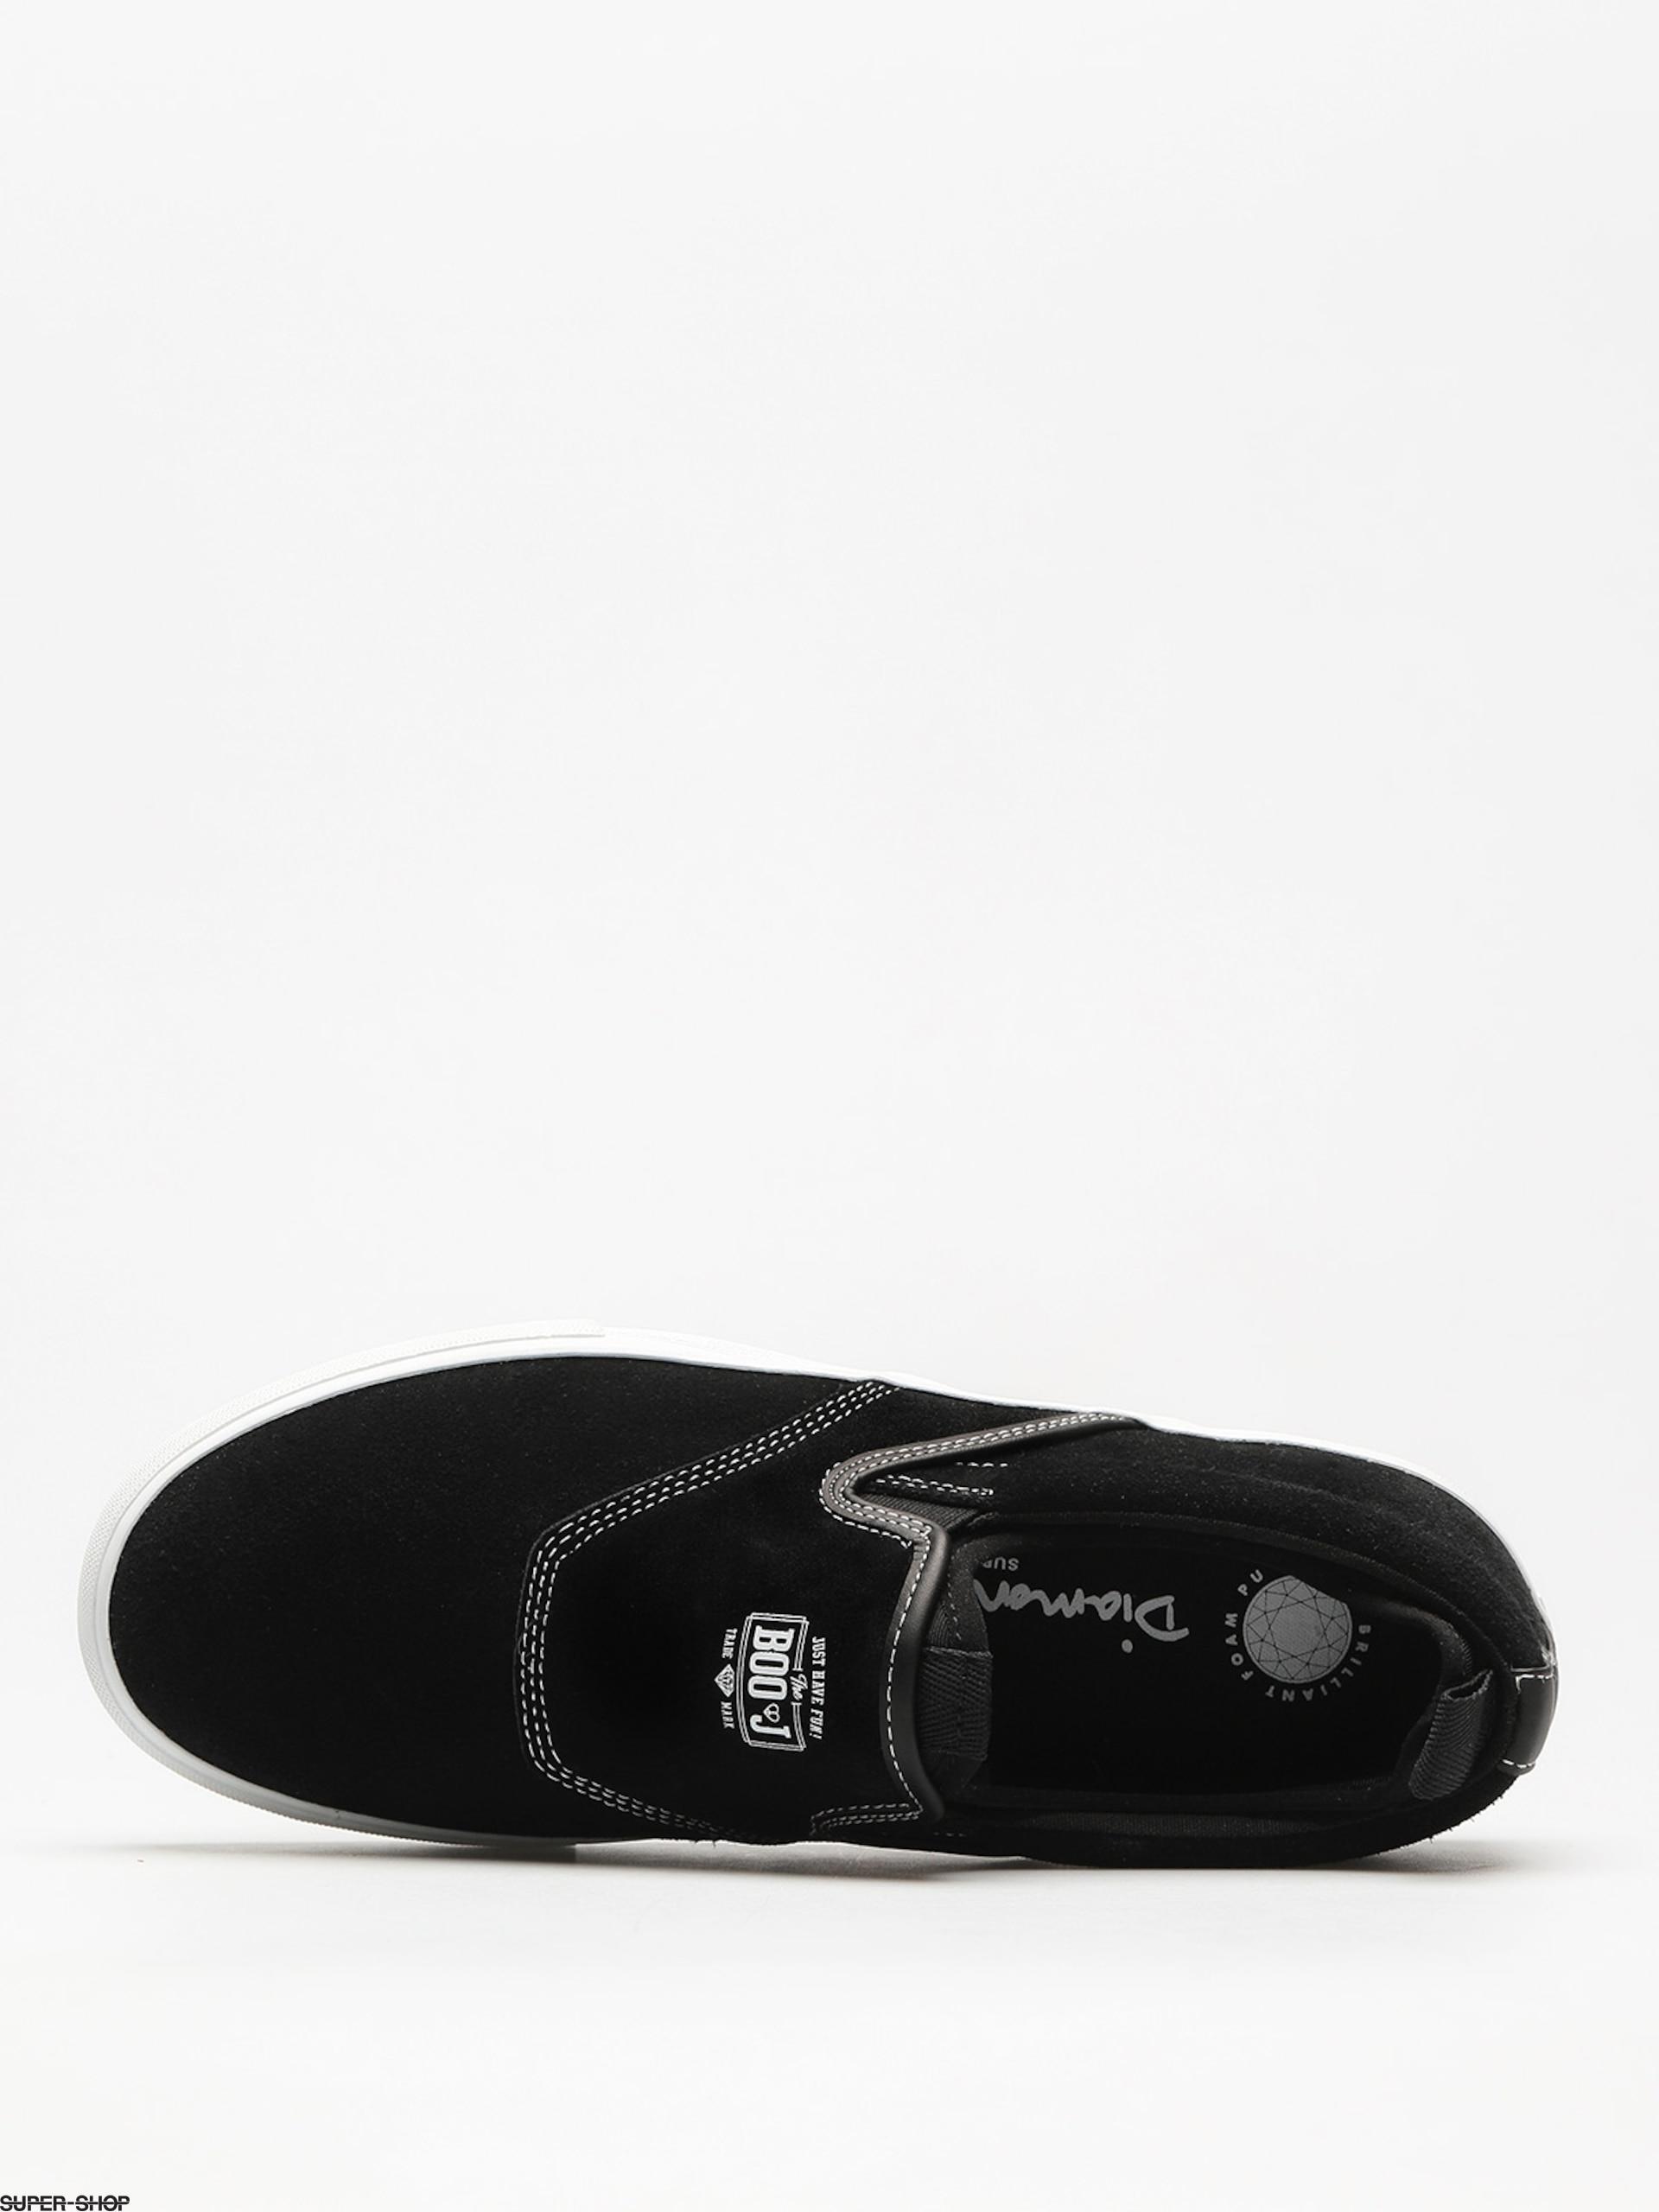 Boo J Diamond Black Shoes